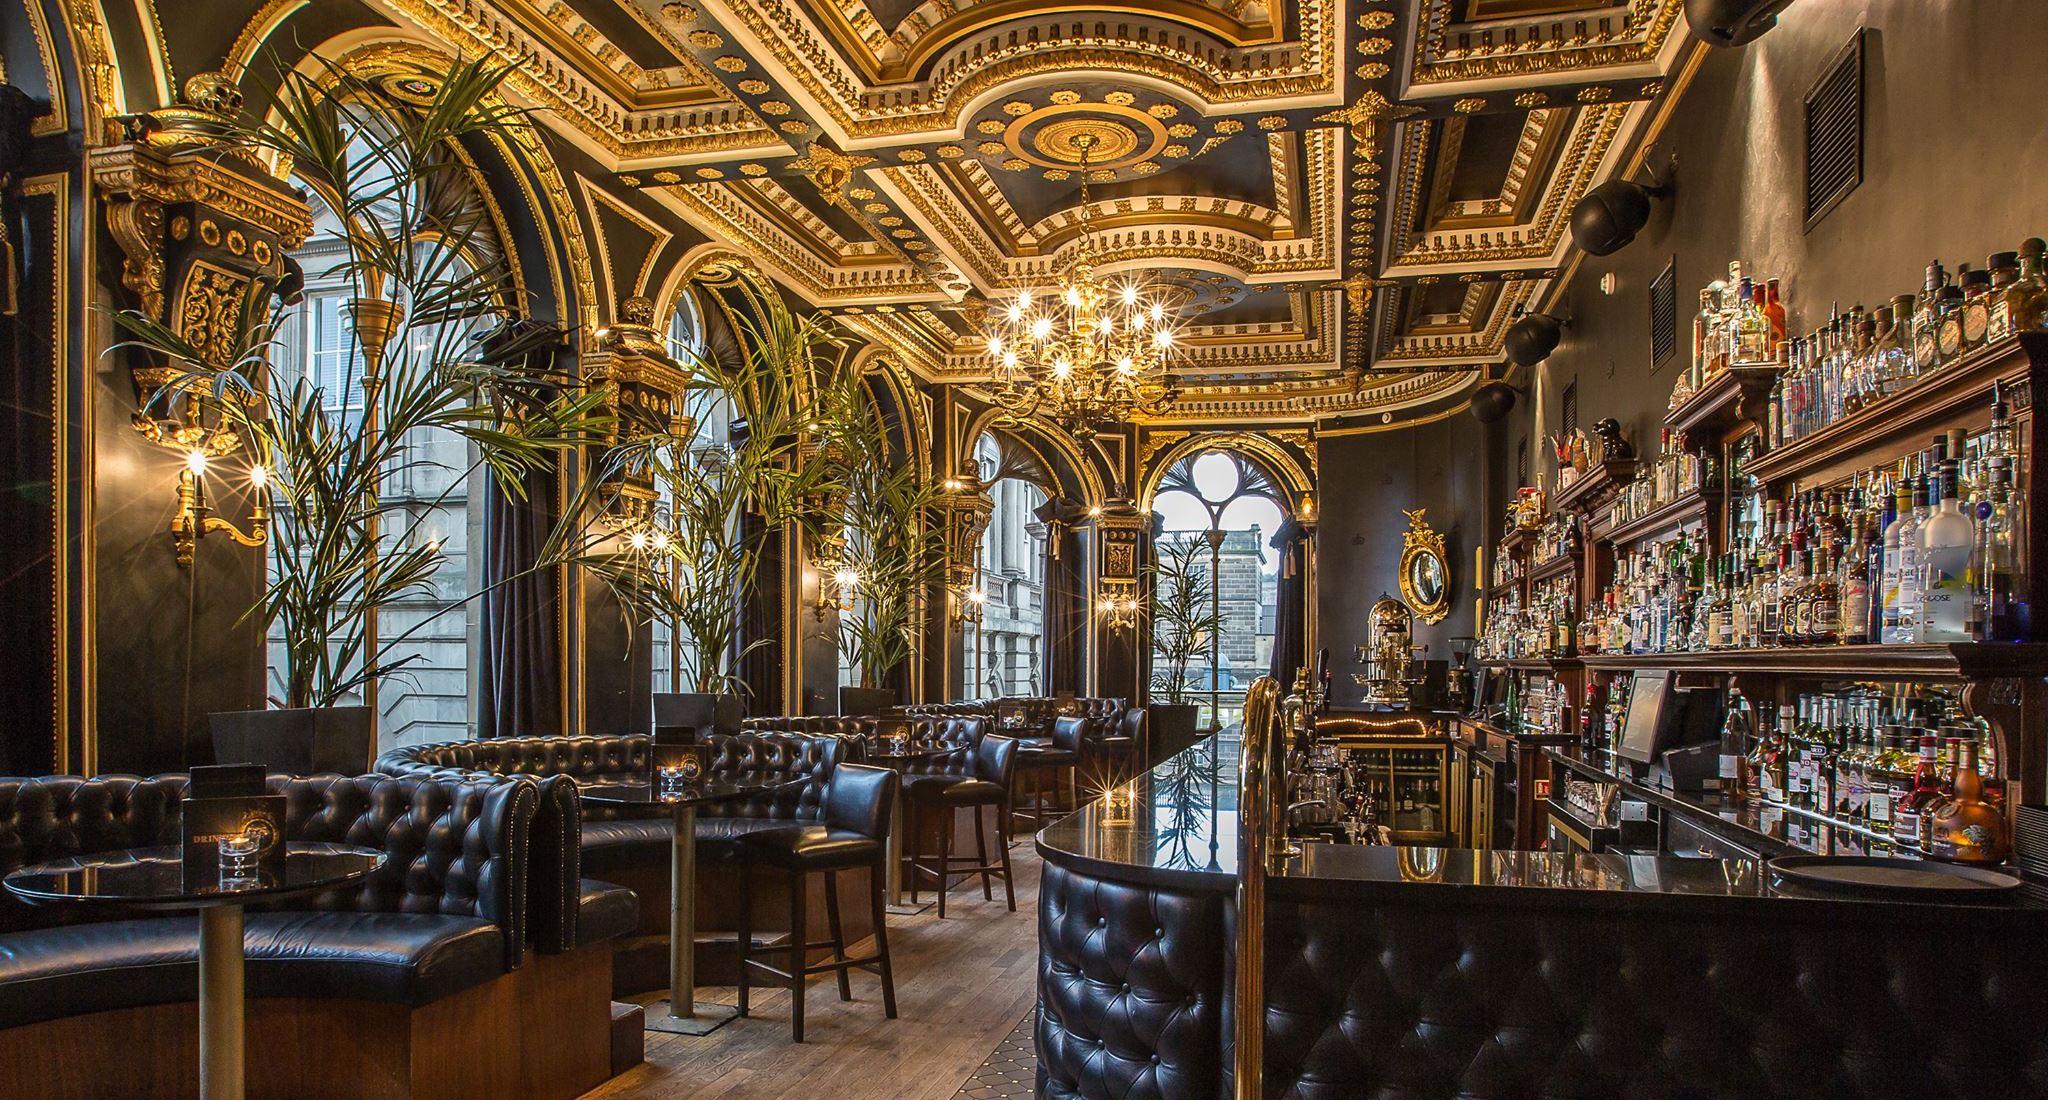 Most Instagrammable Restaurants In The UK